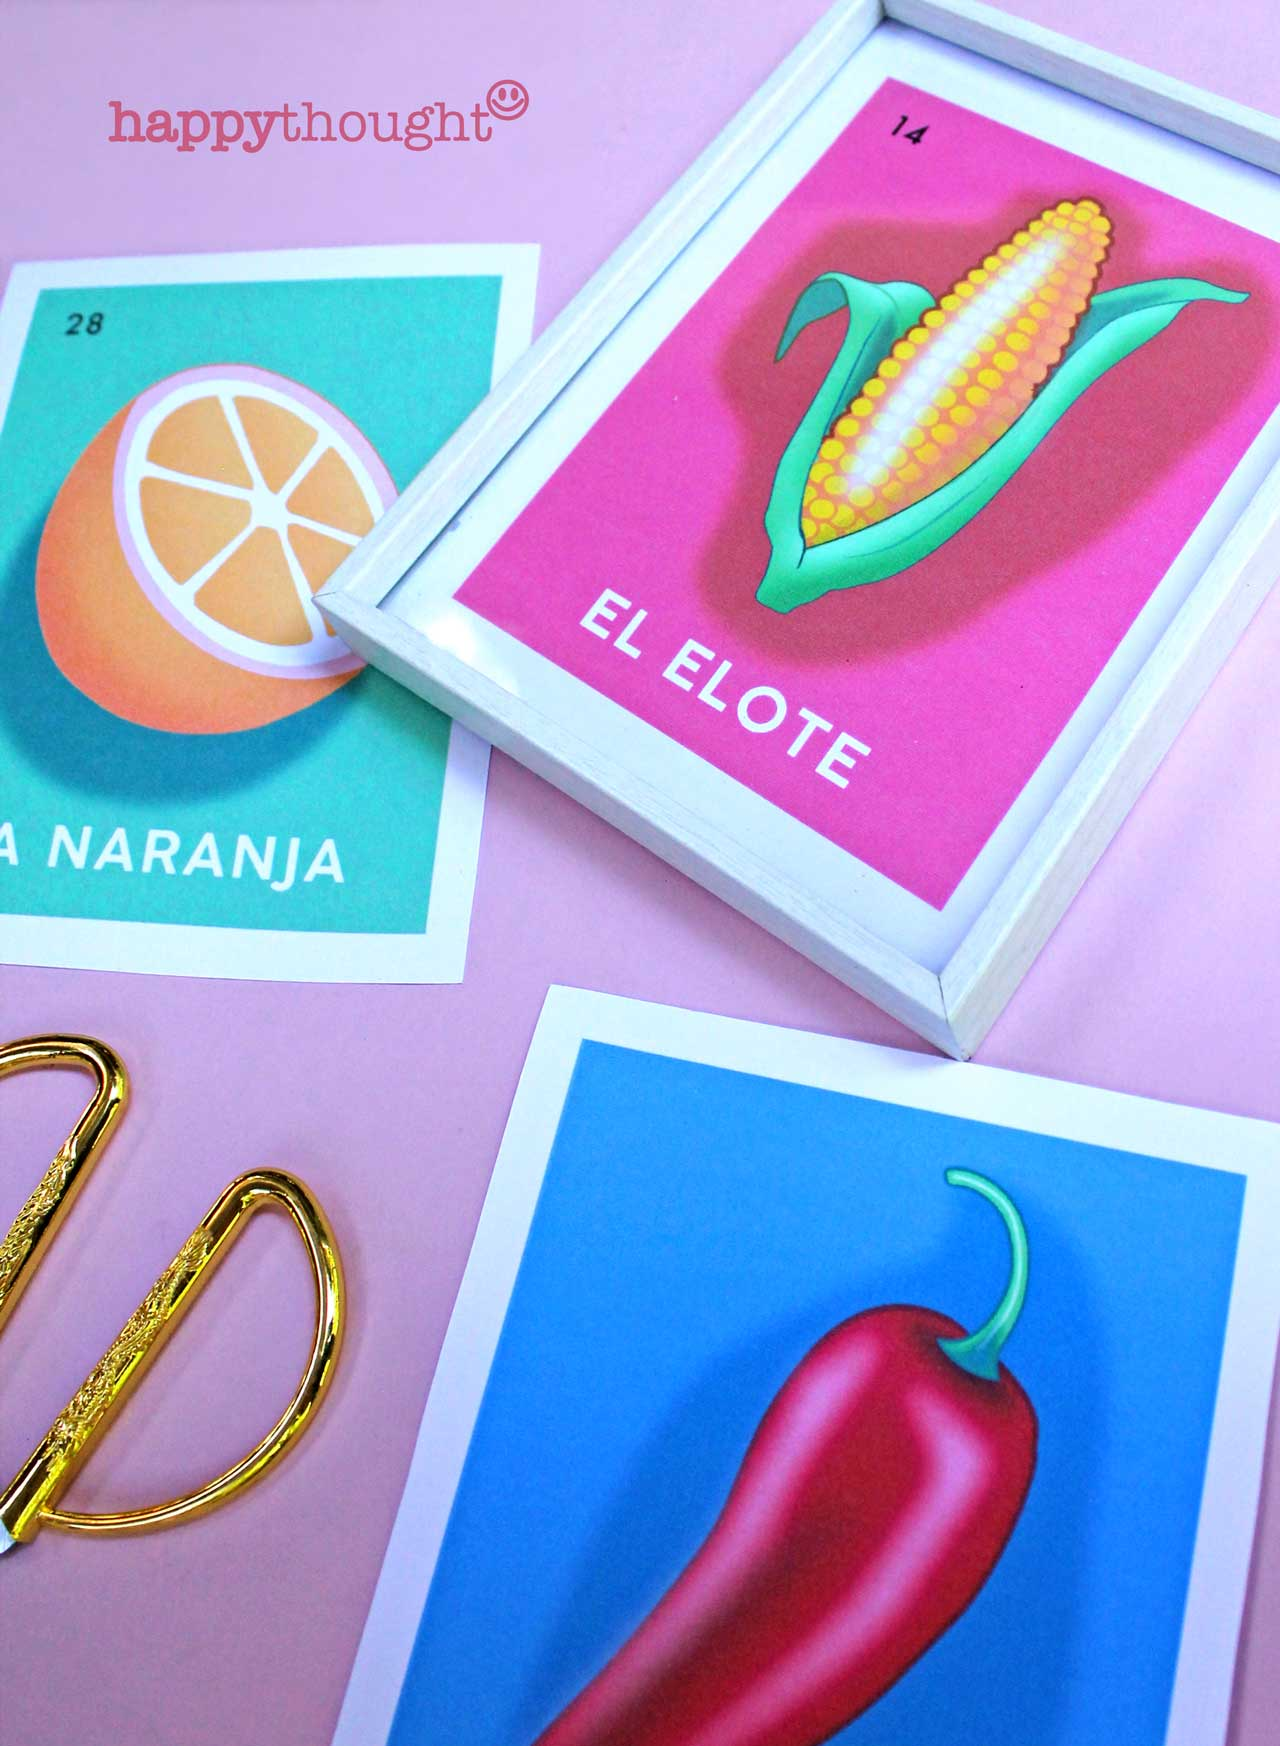 Loteria prints: Sandia, Aguacate, Jalepeño, Naranja, Piña and Elote.